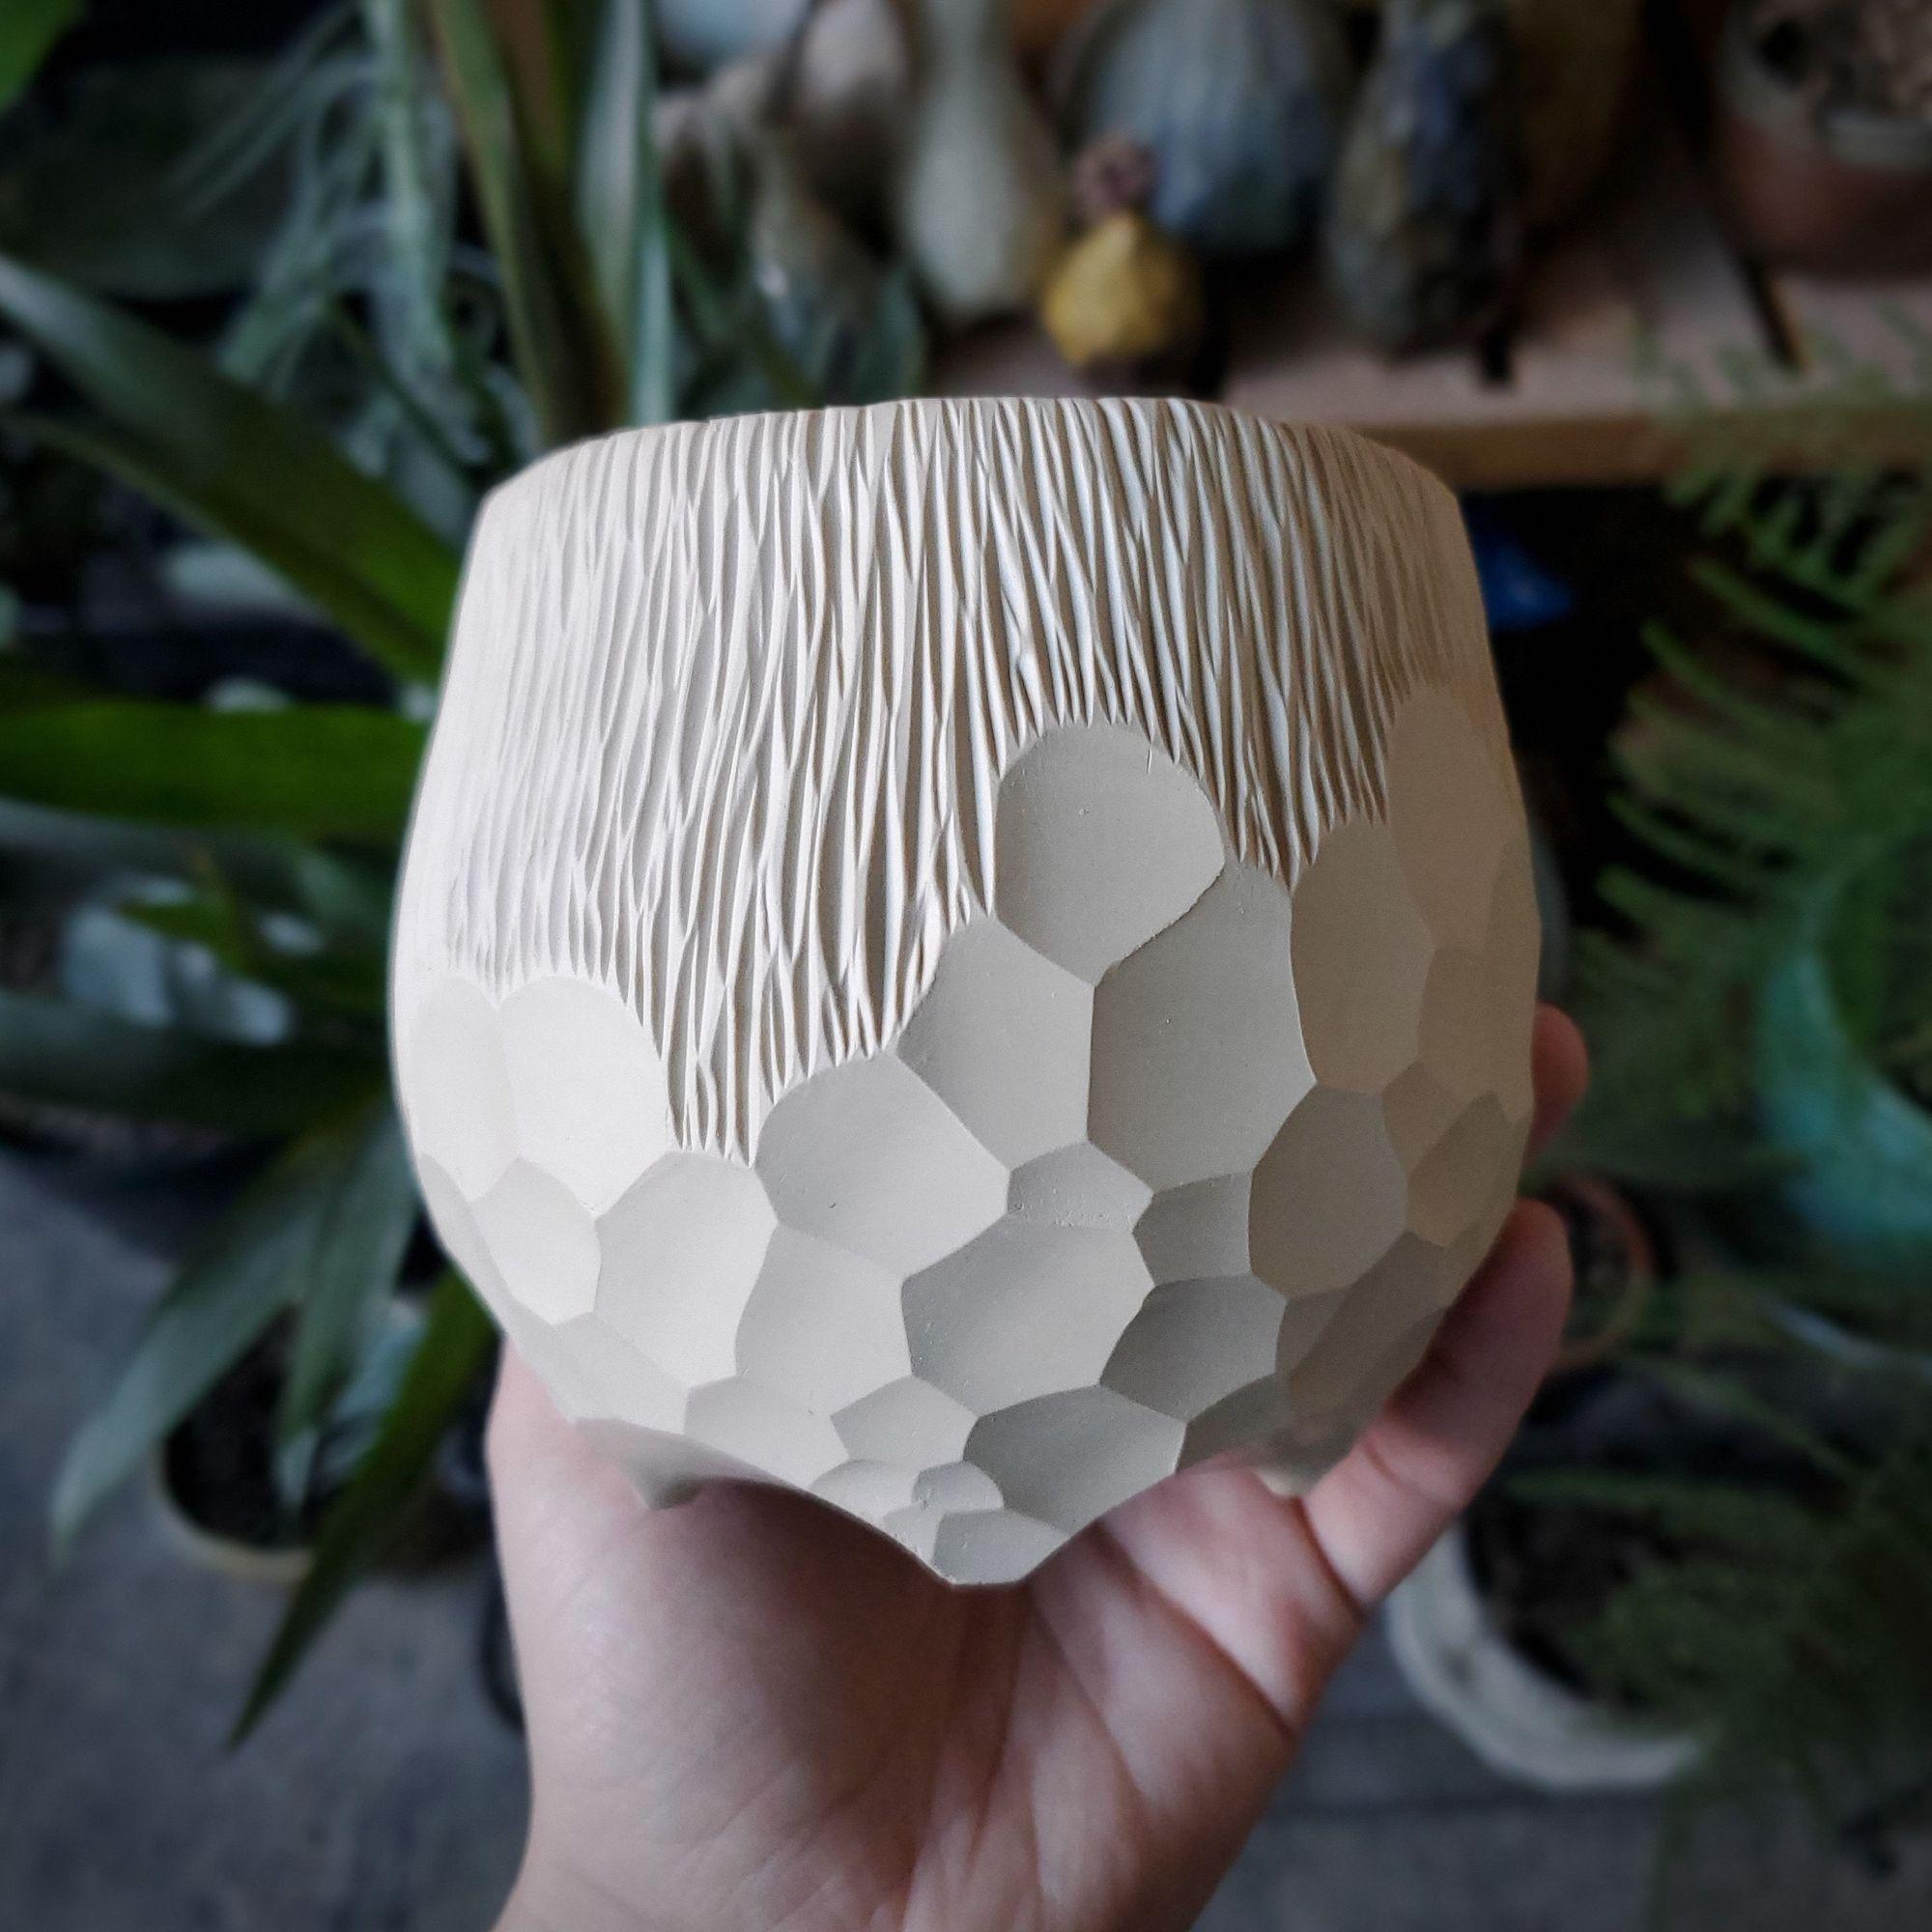 Just an appreciation for texture.  . . . . . .  #kaiceramics #kaitlynchipps #kaitlynceramics #pottery #ceramics #elvish #whimsical  #kilntotable #fantasy #ceramicart #art #fantasyinspired #femaleartist #potterymagic #elegant #elegance #porcelain #earthy #ethereal #makersgonnamake #pottersofinstagram #potterylife #potterywip #artwip